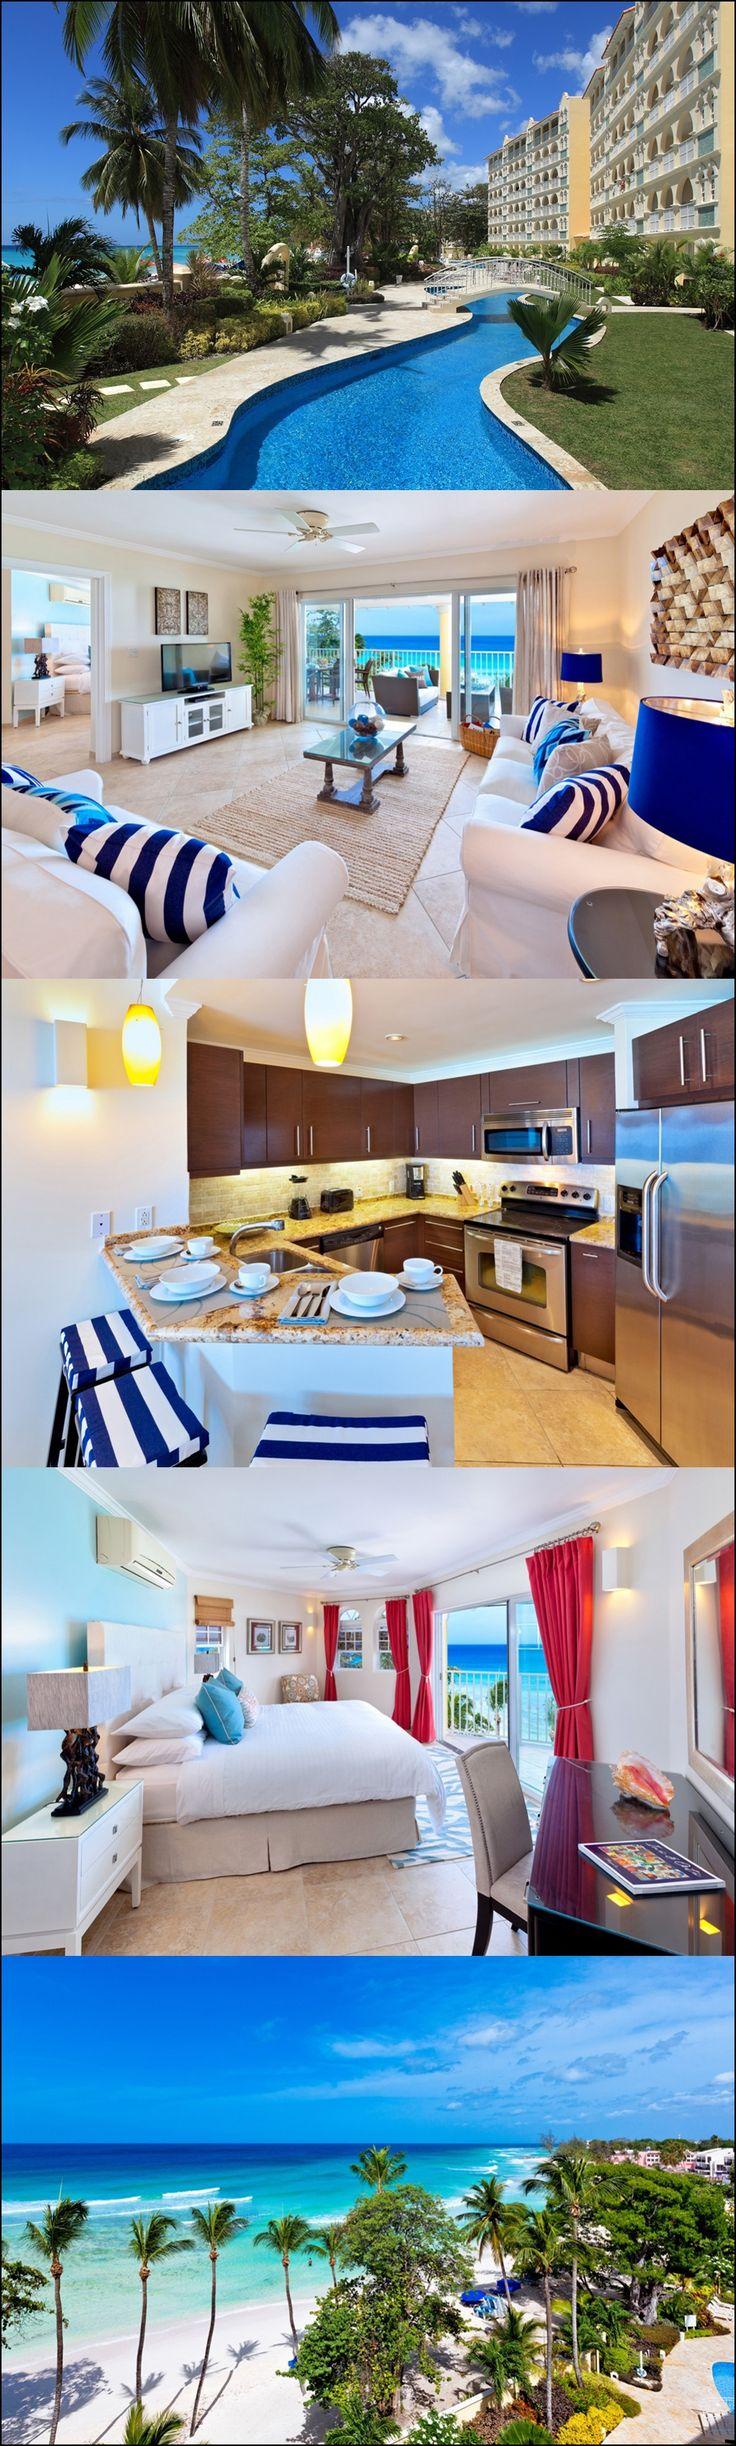 Resort Villa Marella - Dover Beach, Barbados - Luxurious villa with a stunning view for 6 personen -- More info? mail@xclusivebarbados.com or call +31 (0)85 401 0902